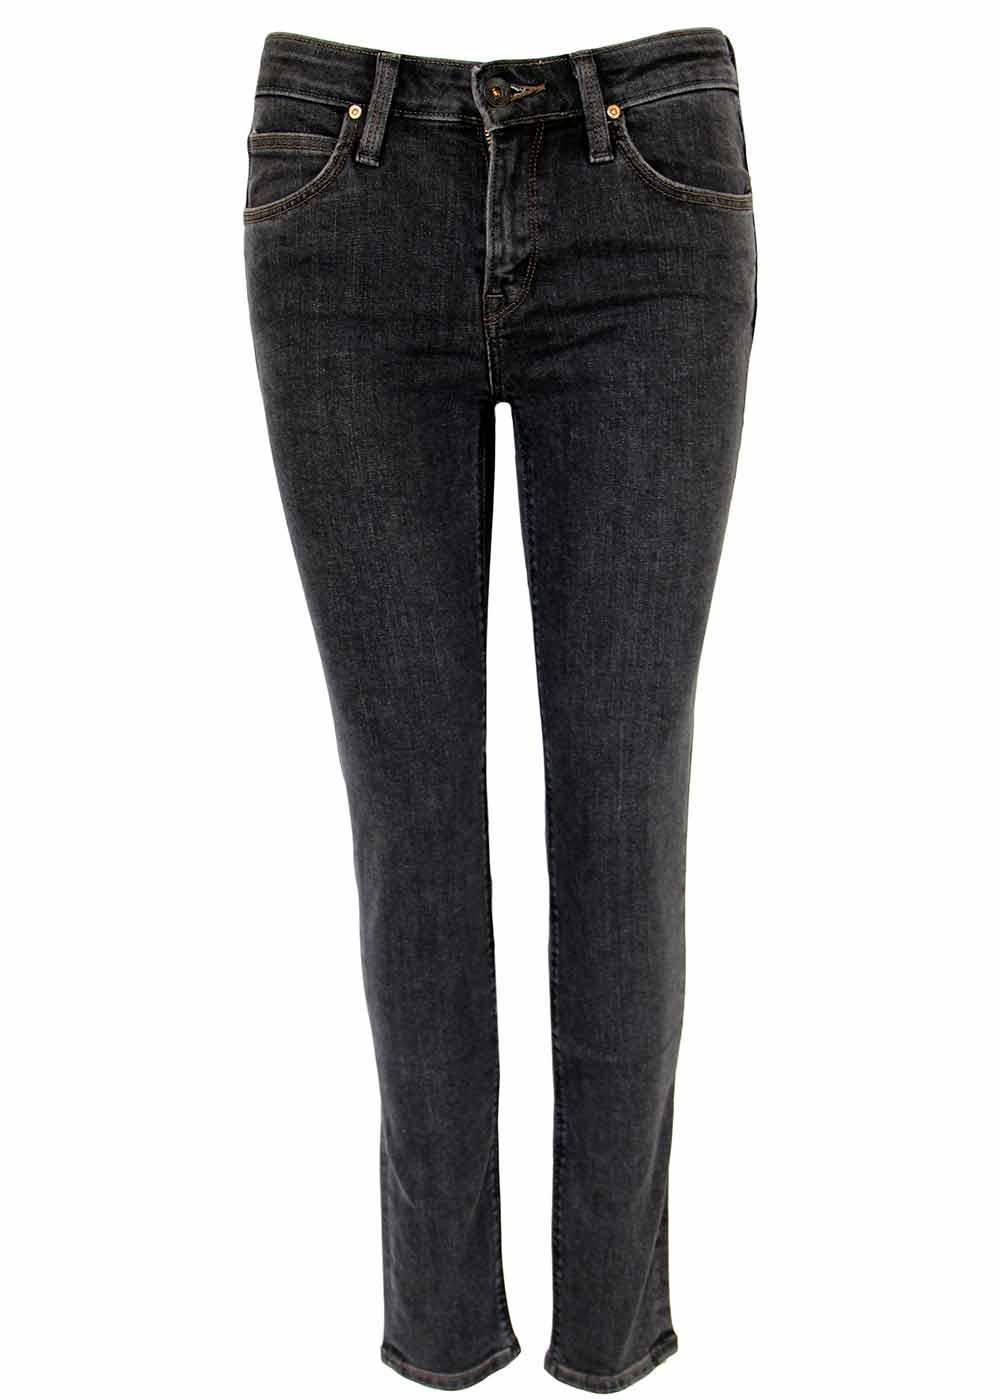 Scarlett LEE Retro Black Wash Skinny Denim Jeans